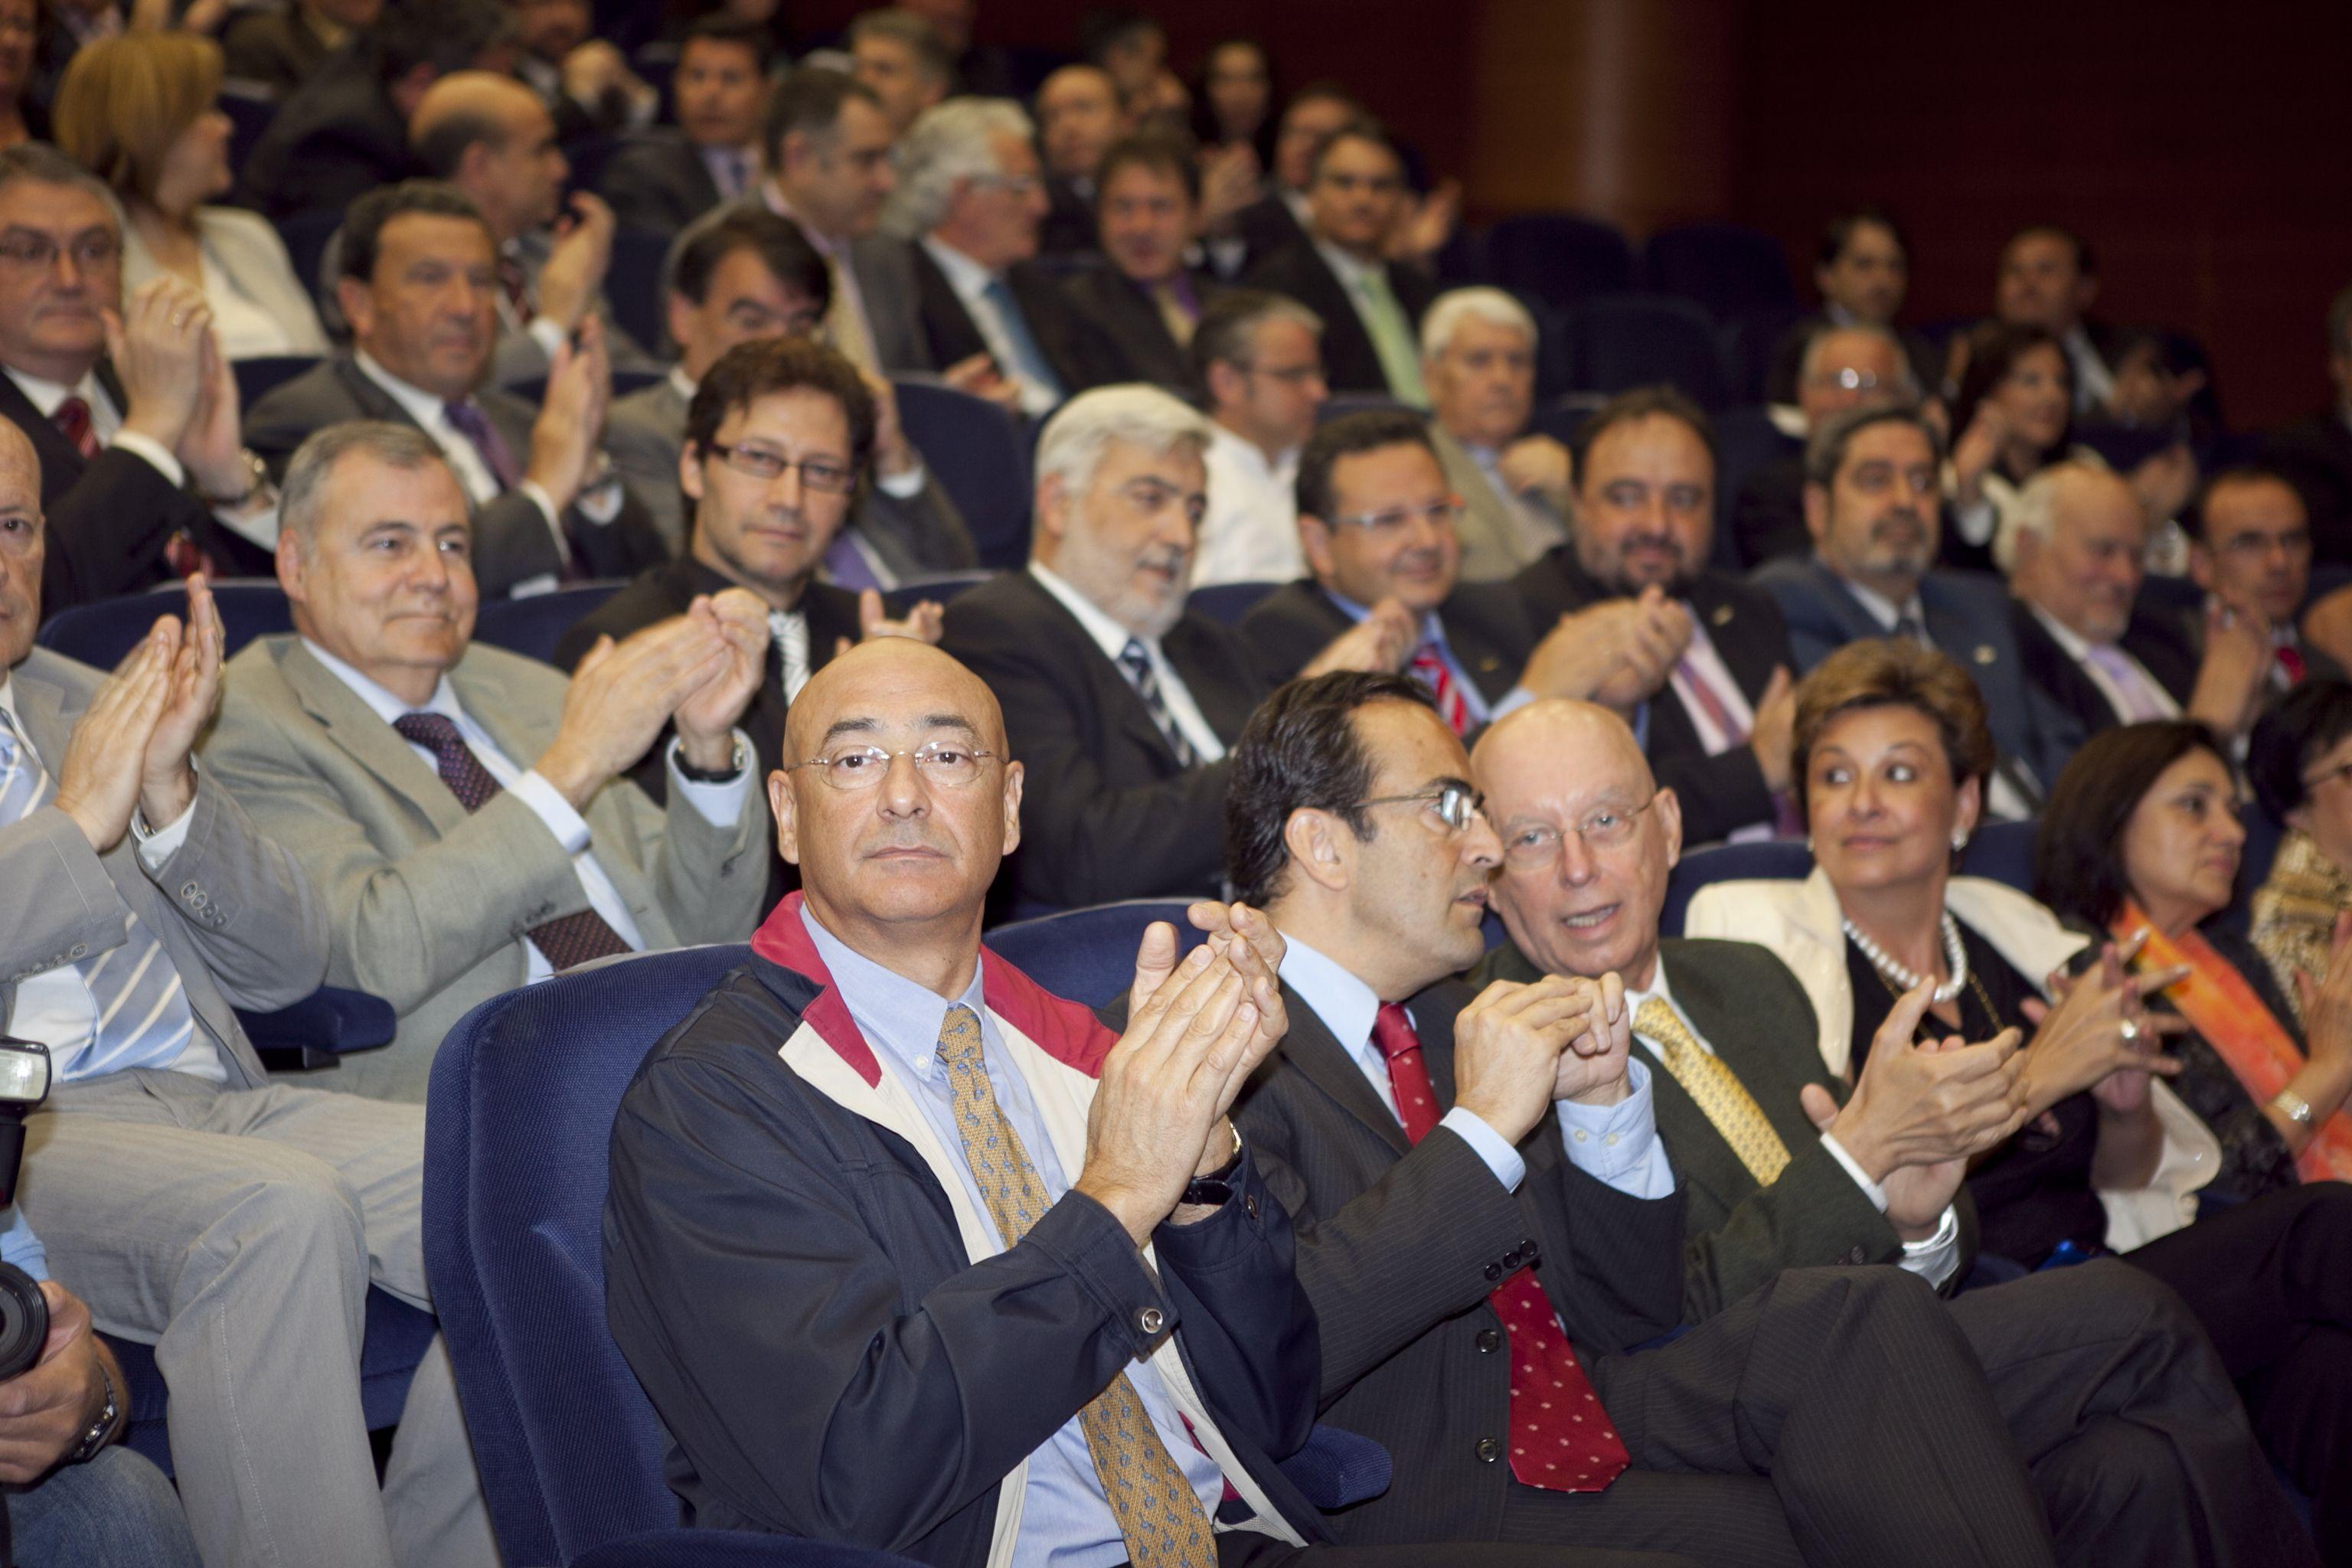 umh-diplomas-rector_mg_6514.jpg